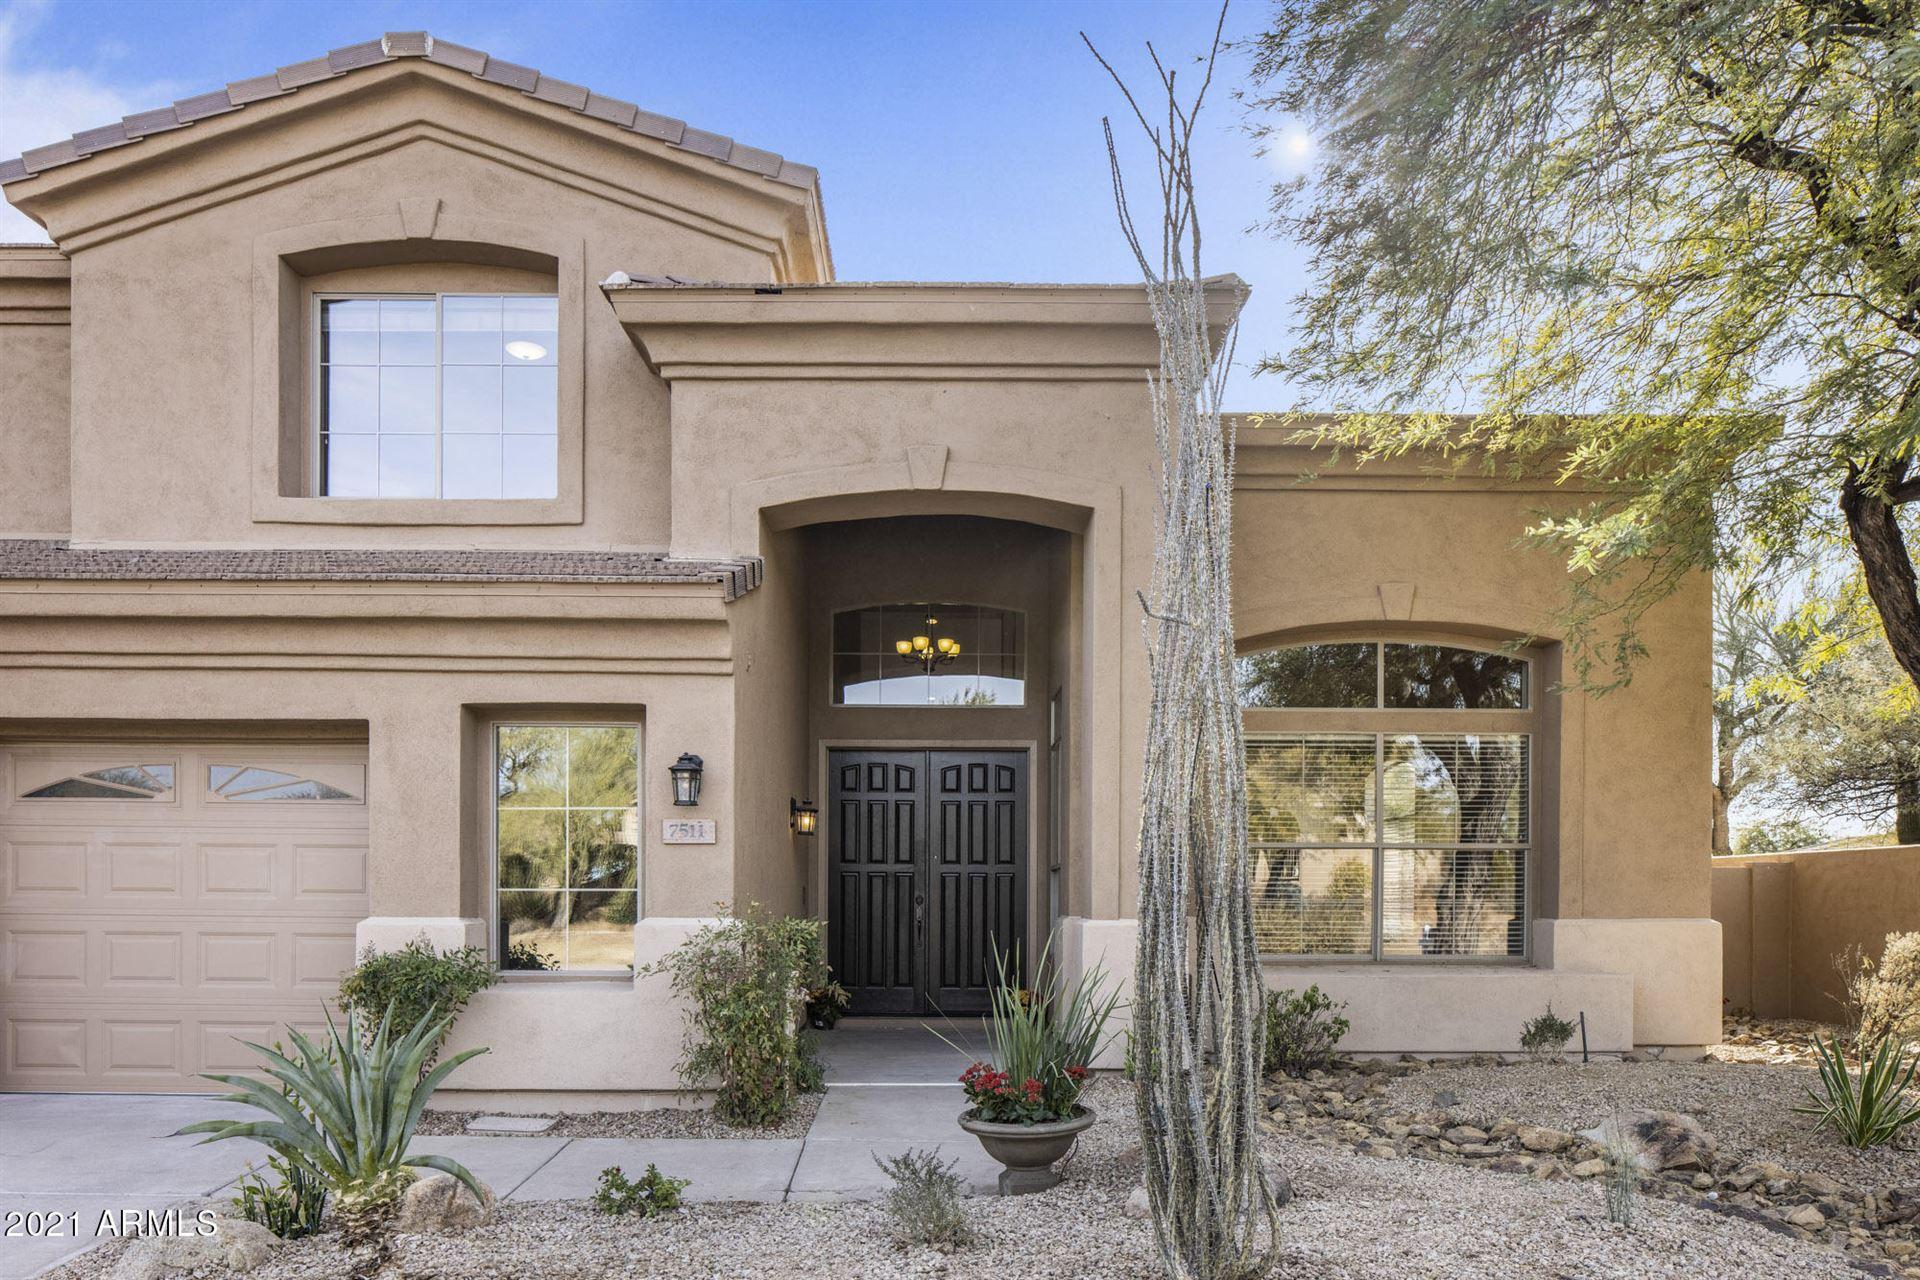 Photo for 7511 E TAILSPIN Lane, Scottsdale, AZ 85255 (MLS # 6178184)